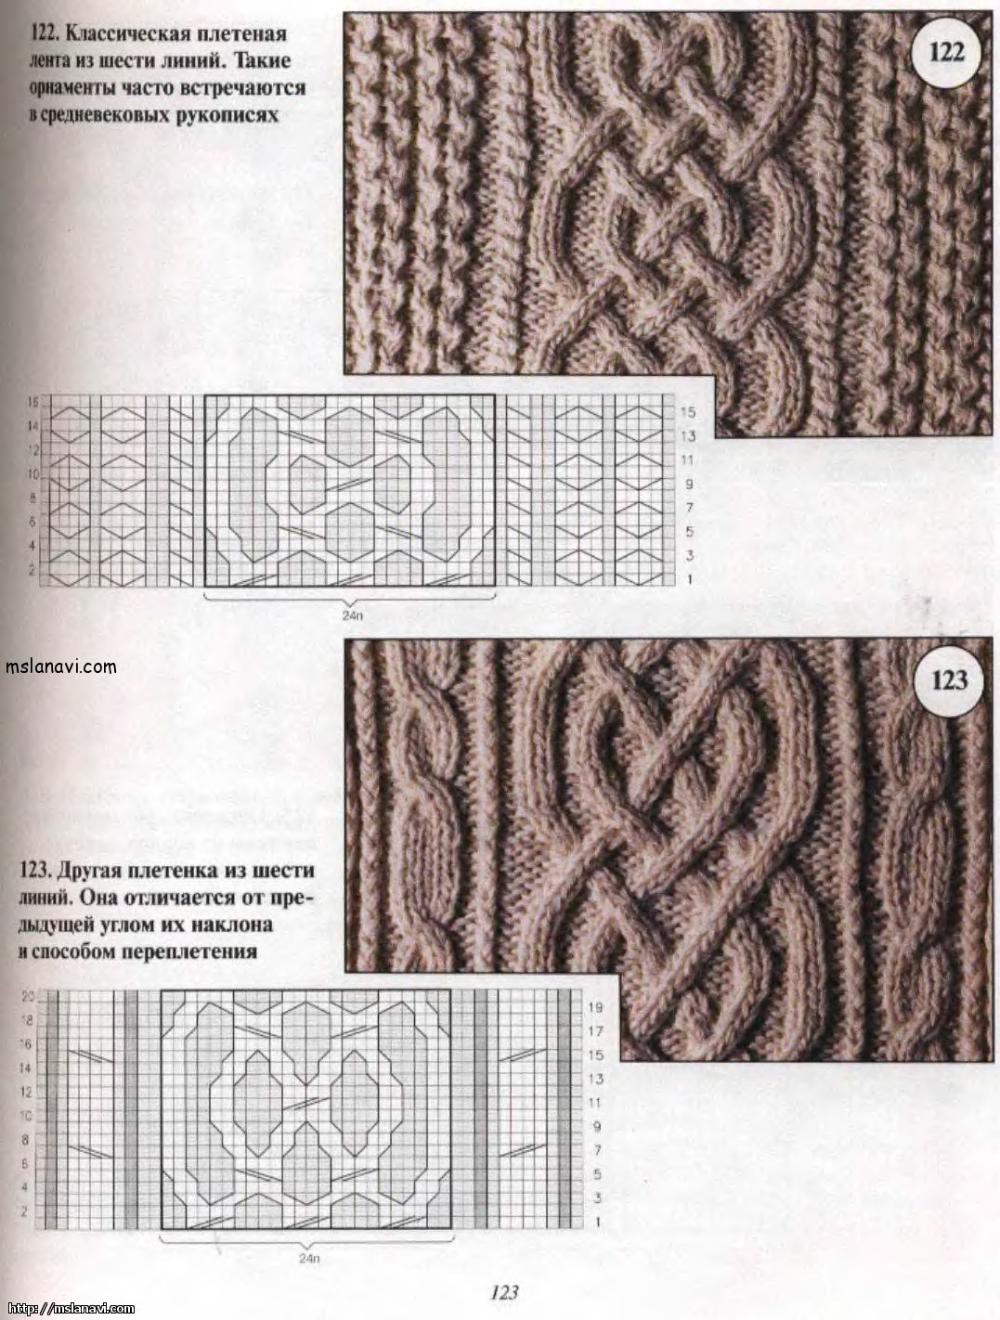 Mslanavi Com Knitting Knittingpatterns Stricken Strickmuster Knittingcharts Knitstitches Zopfmuster Stickningsmaskor Stickningsmonster Handstickning